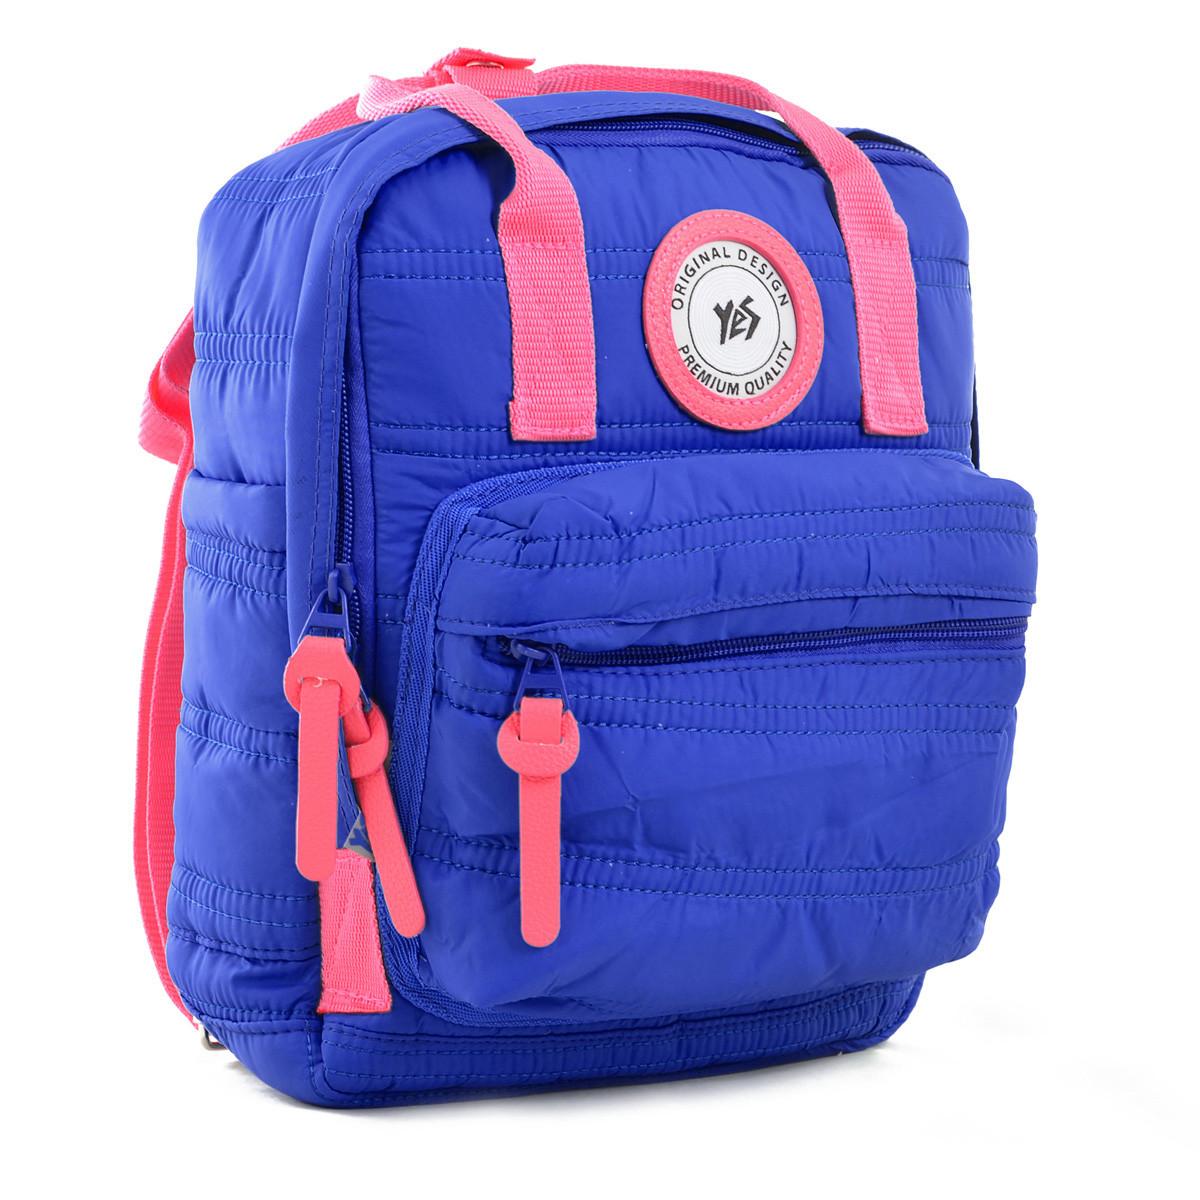 Рюкзак молодежный YES  ST-27 Midnight blue, 29*23*10